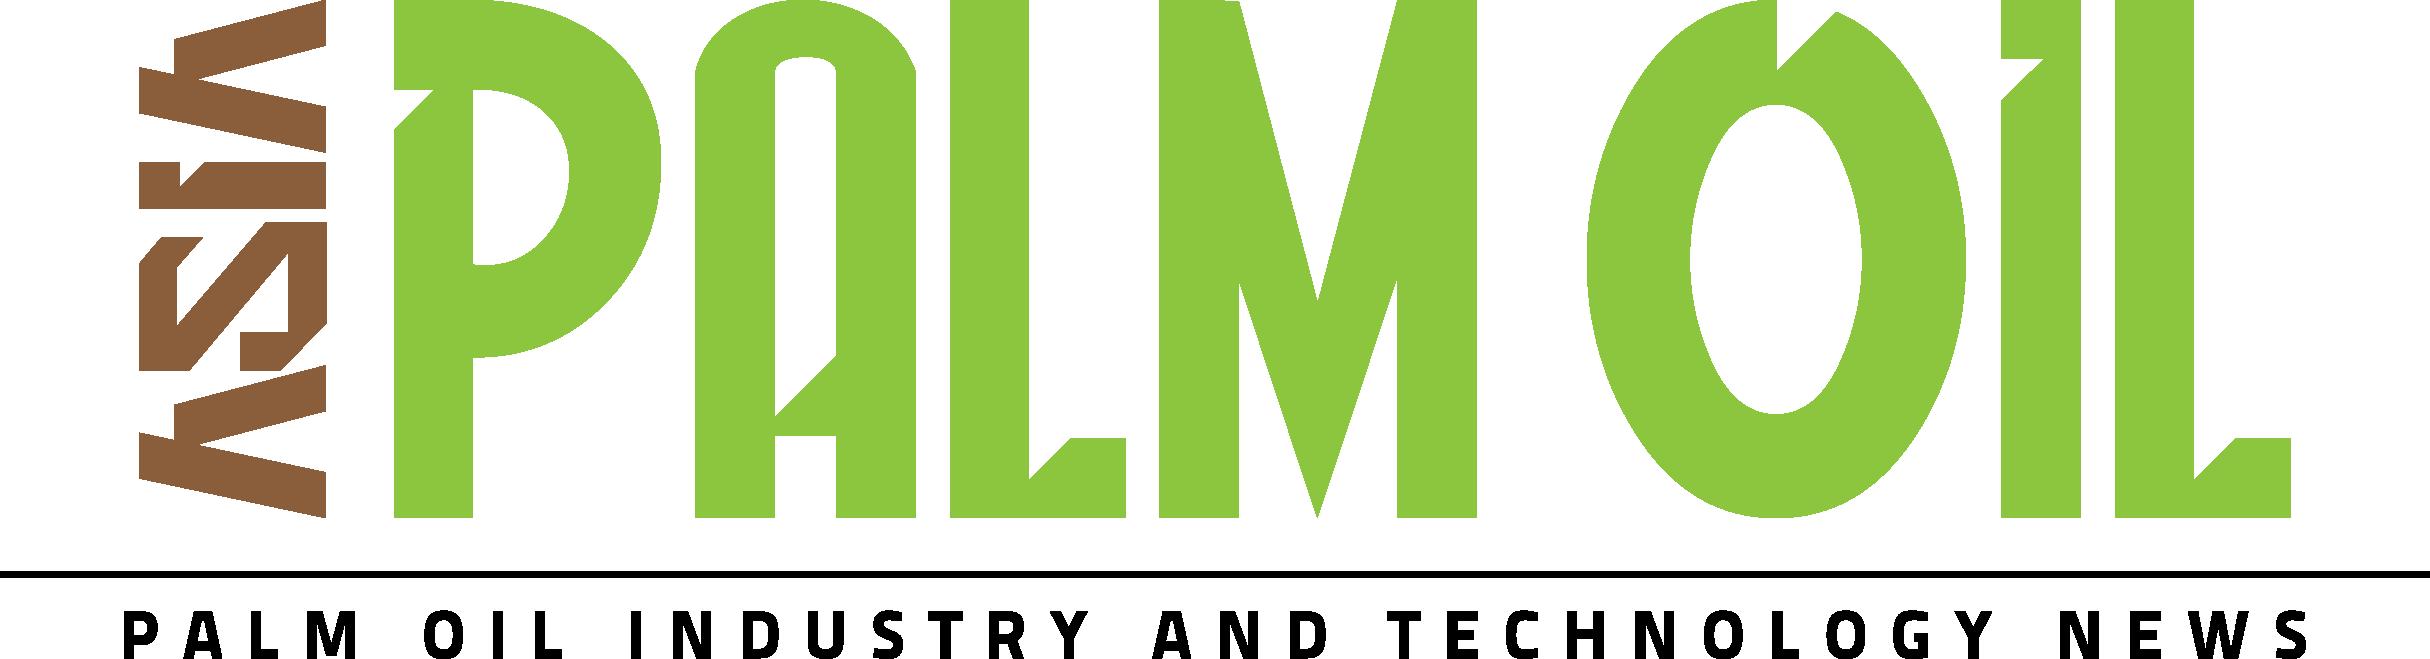 AGRI MALAYSIA | Magazine | Asia Palm Oil | Selangor